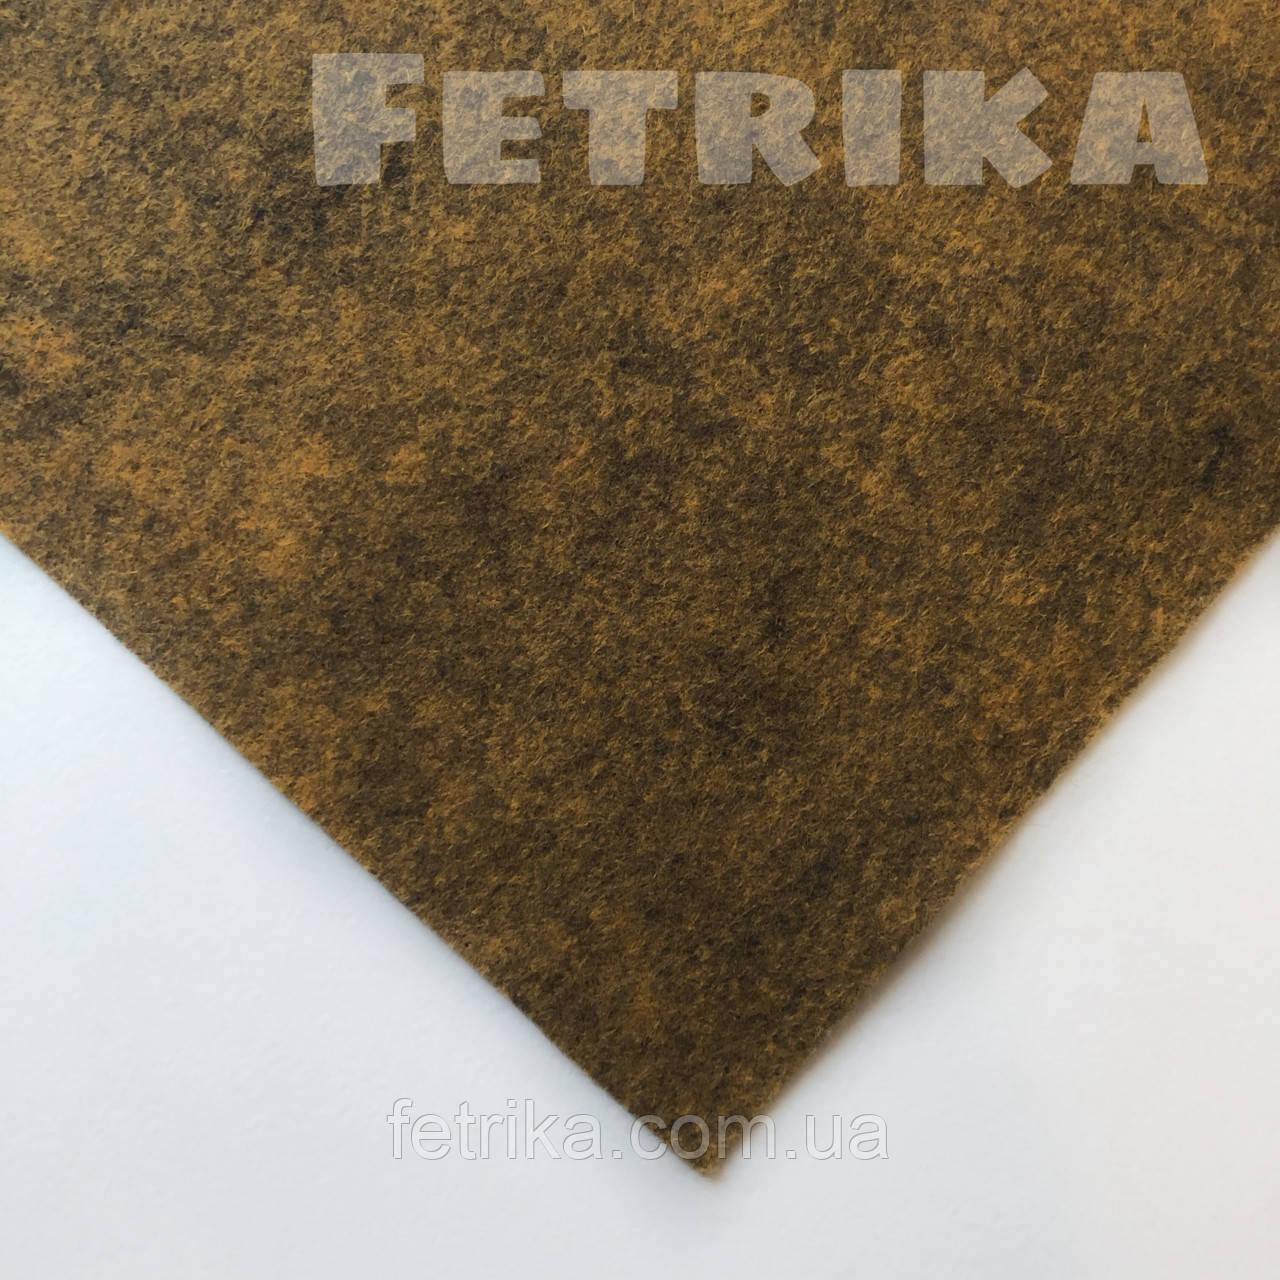 Американский мягкий фетр 1,5 мм, 20*30 см, ЗОЛОТО ГАВАНЫ (2616 Havana gold)